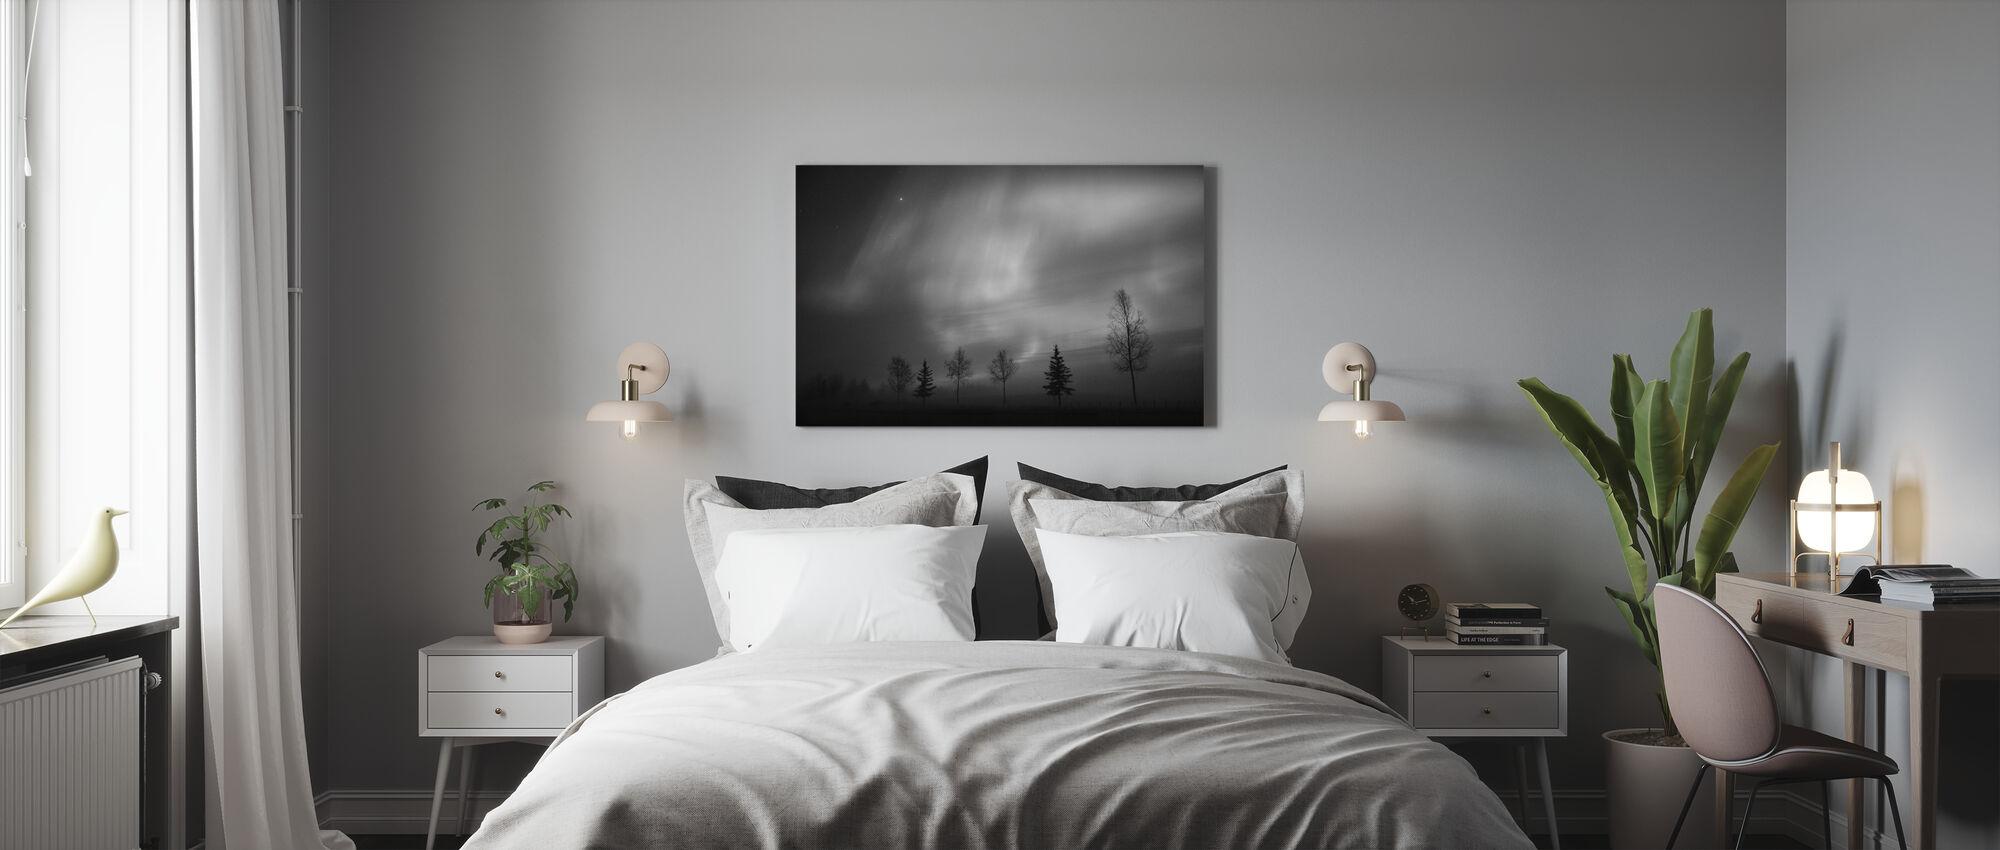 Nordic Lights - Canvas print - Bedroom